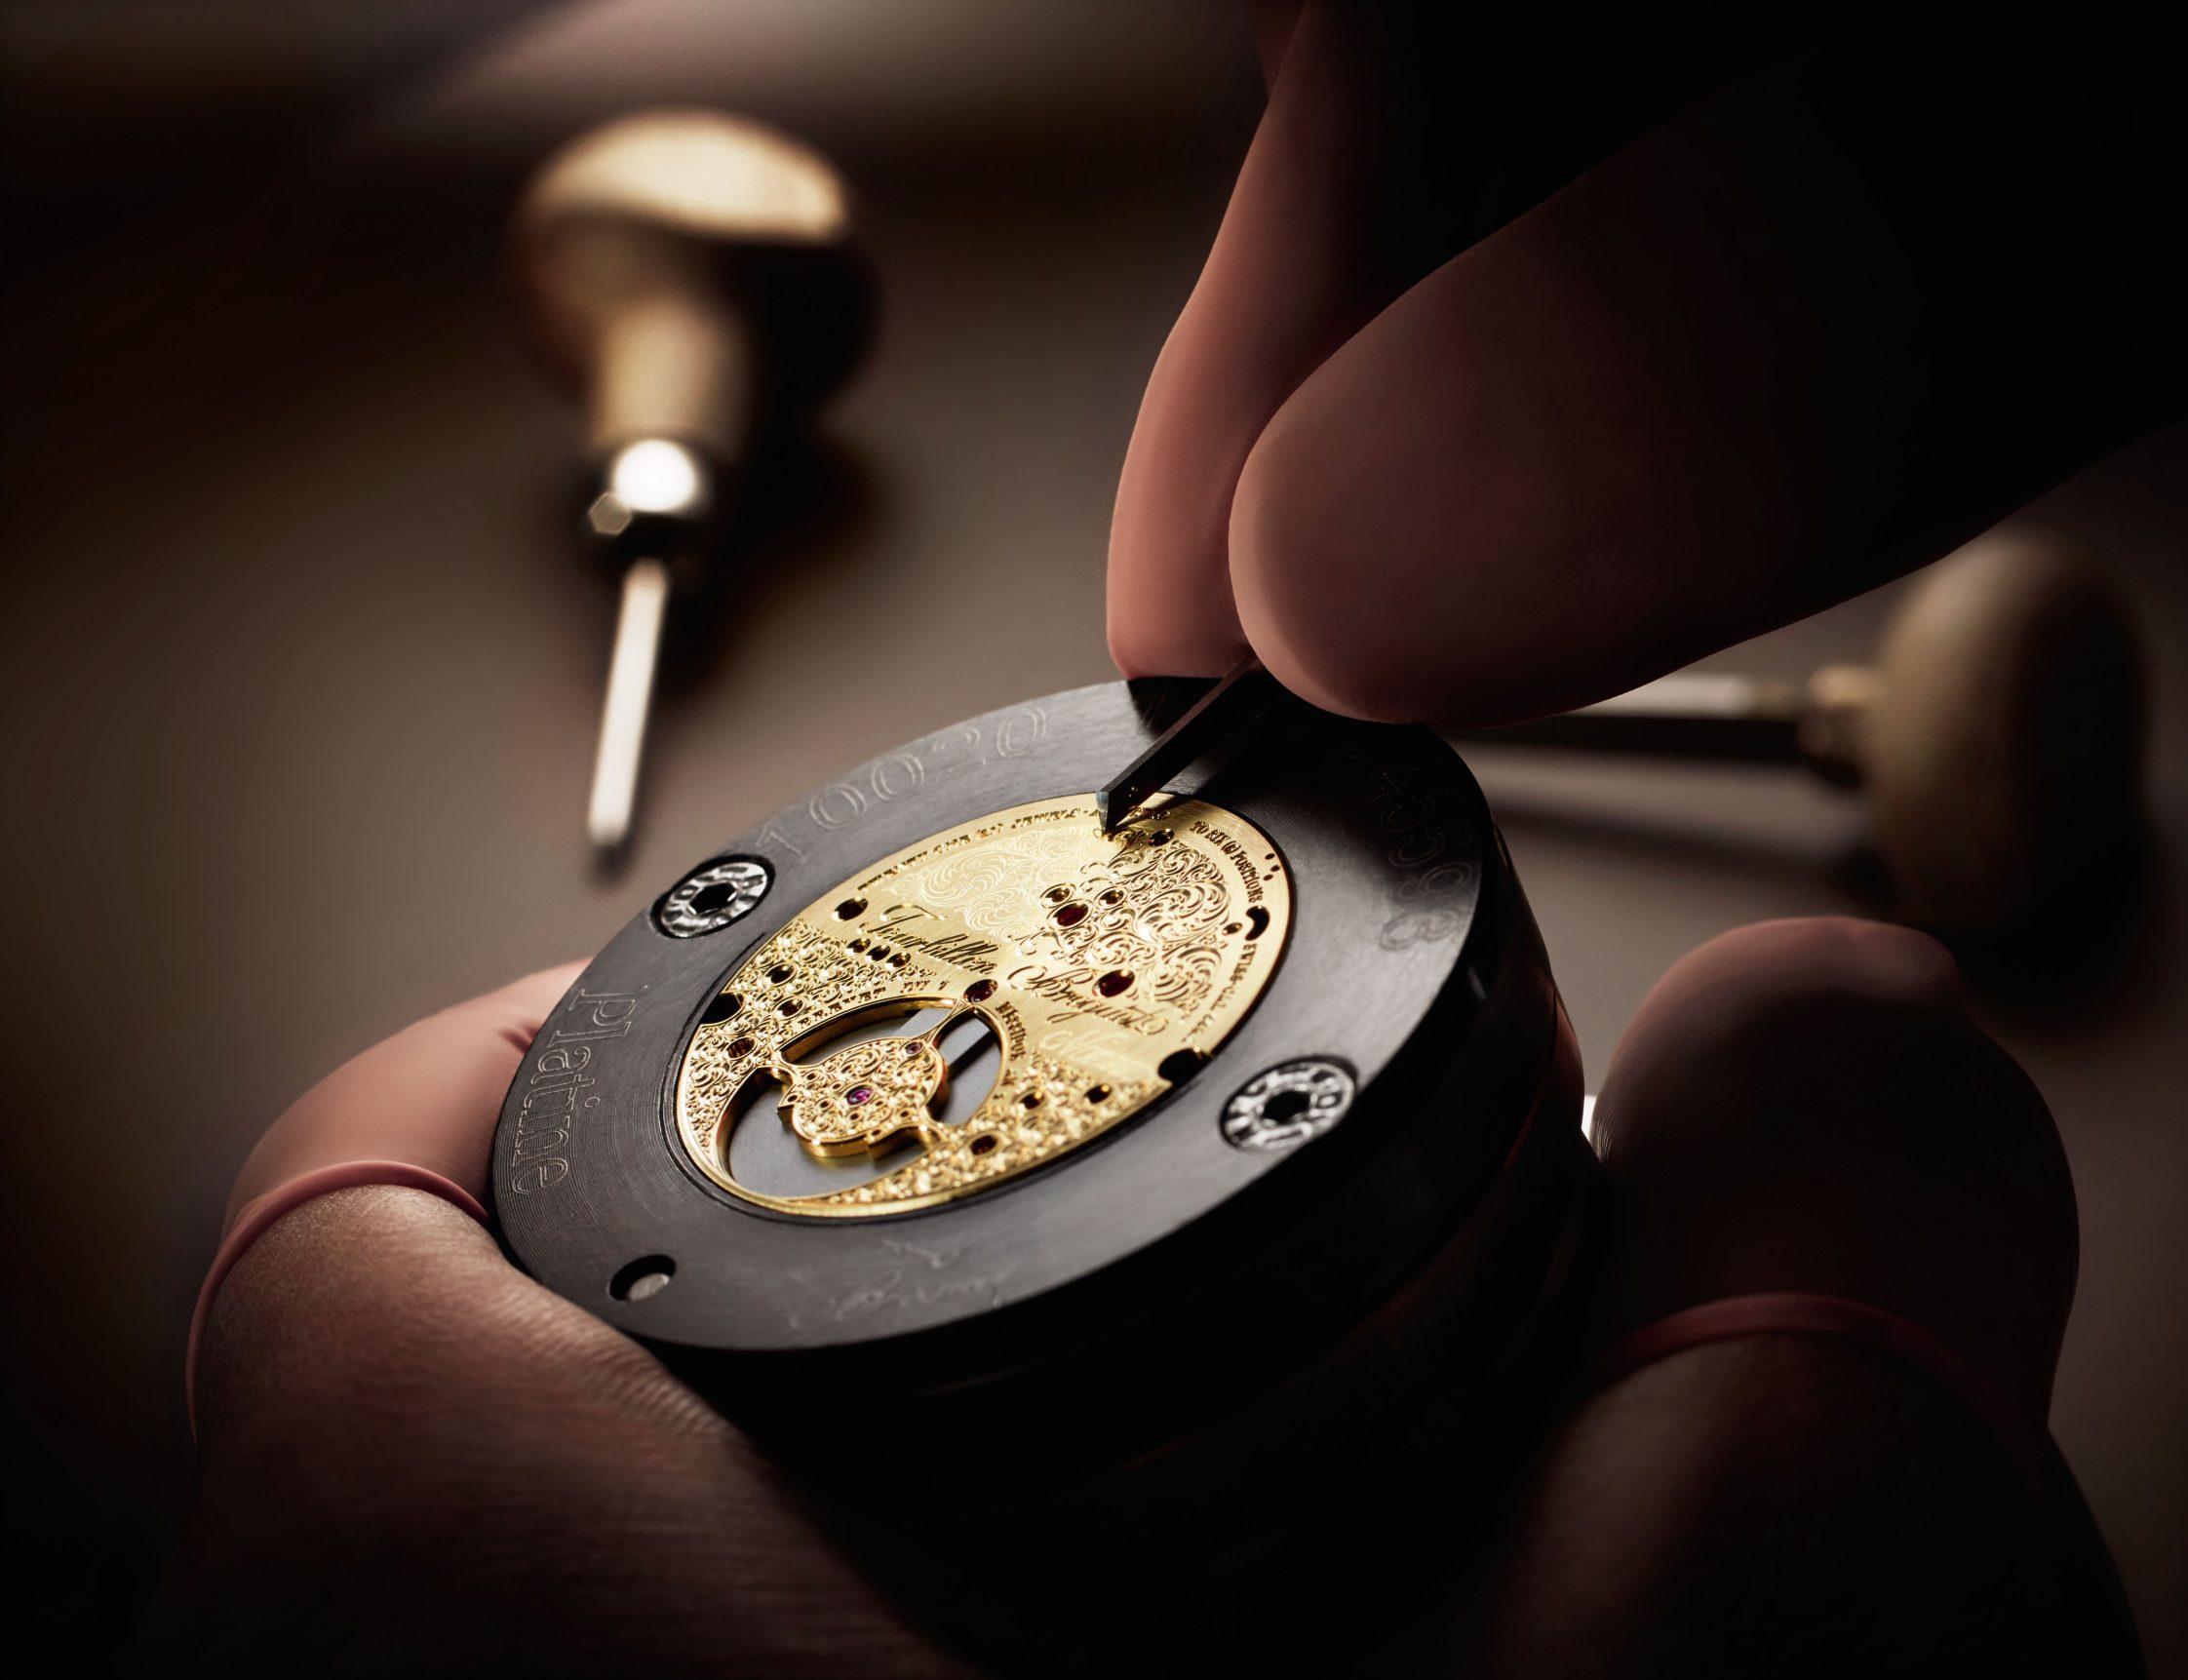 The Art of Breguet: An Engineer's View at Craftsmanship